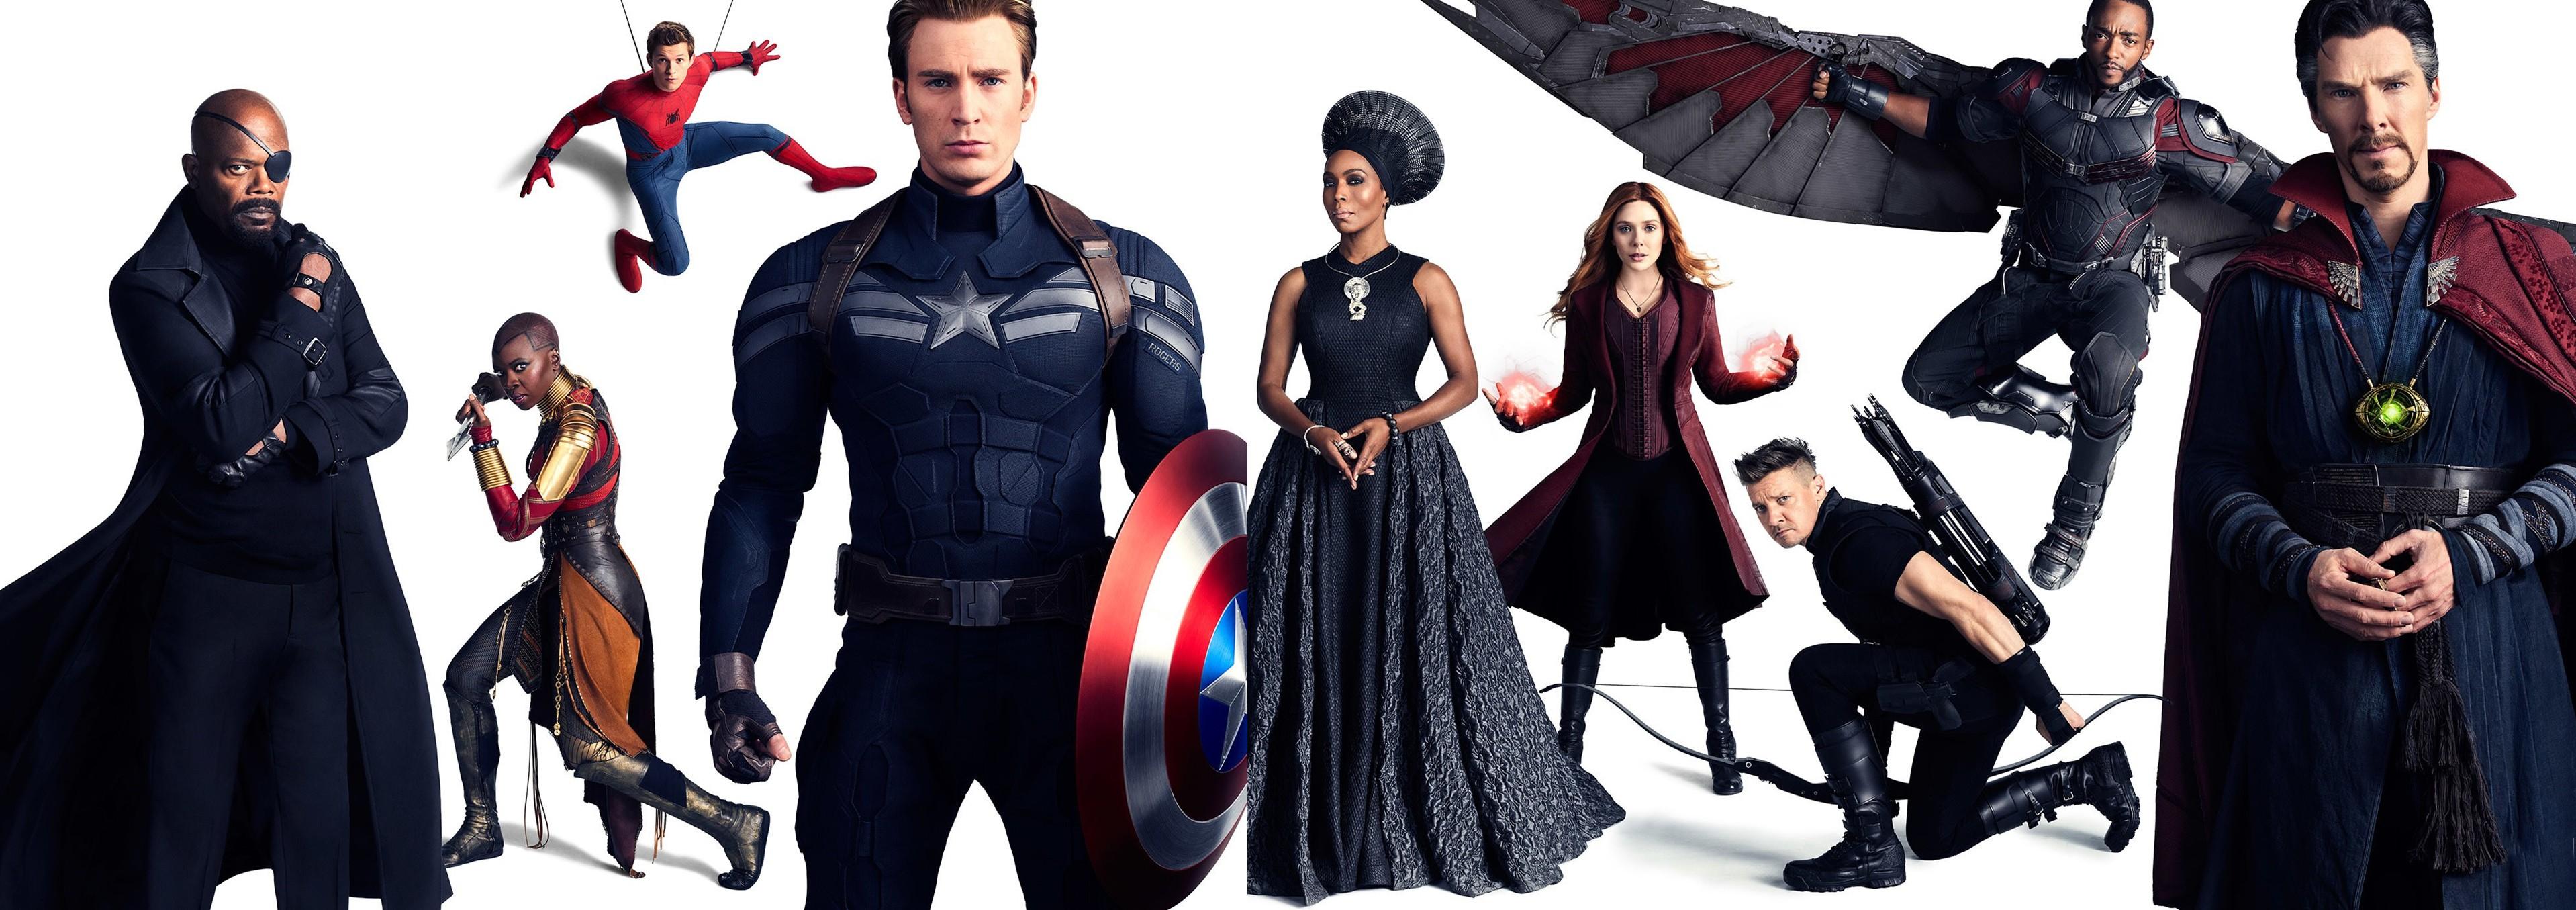 wallpaper avengers: infinity war, captain america, spiderman